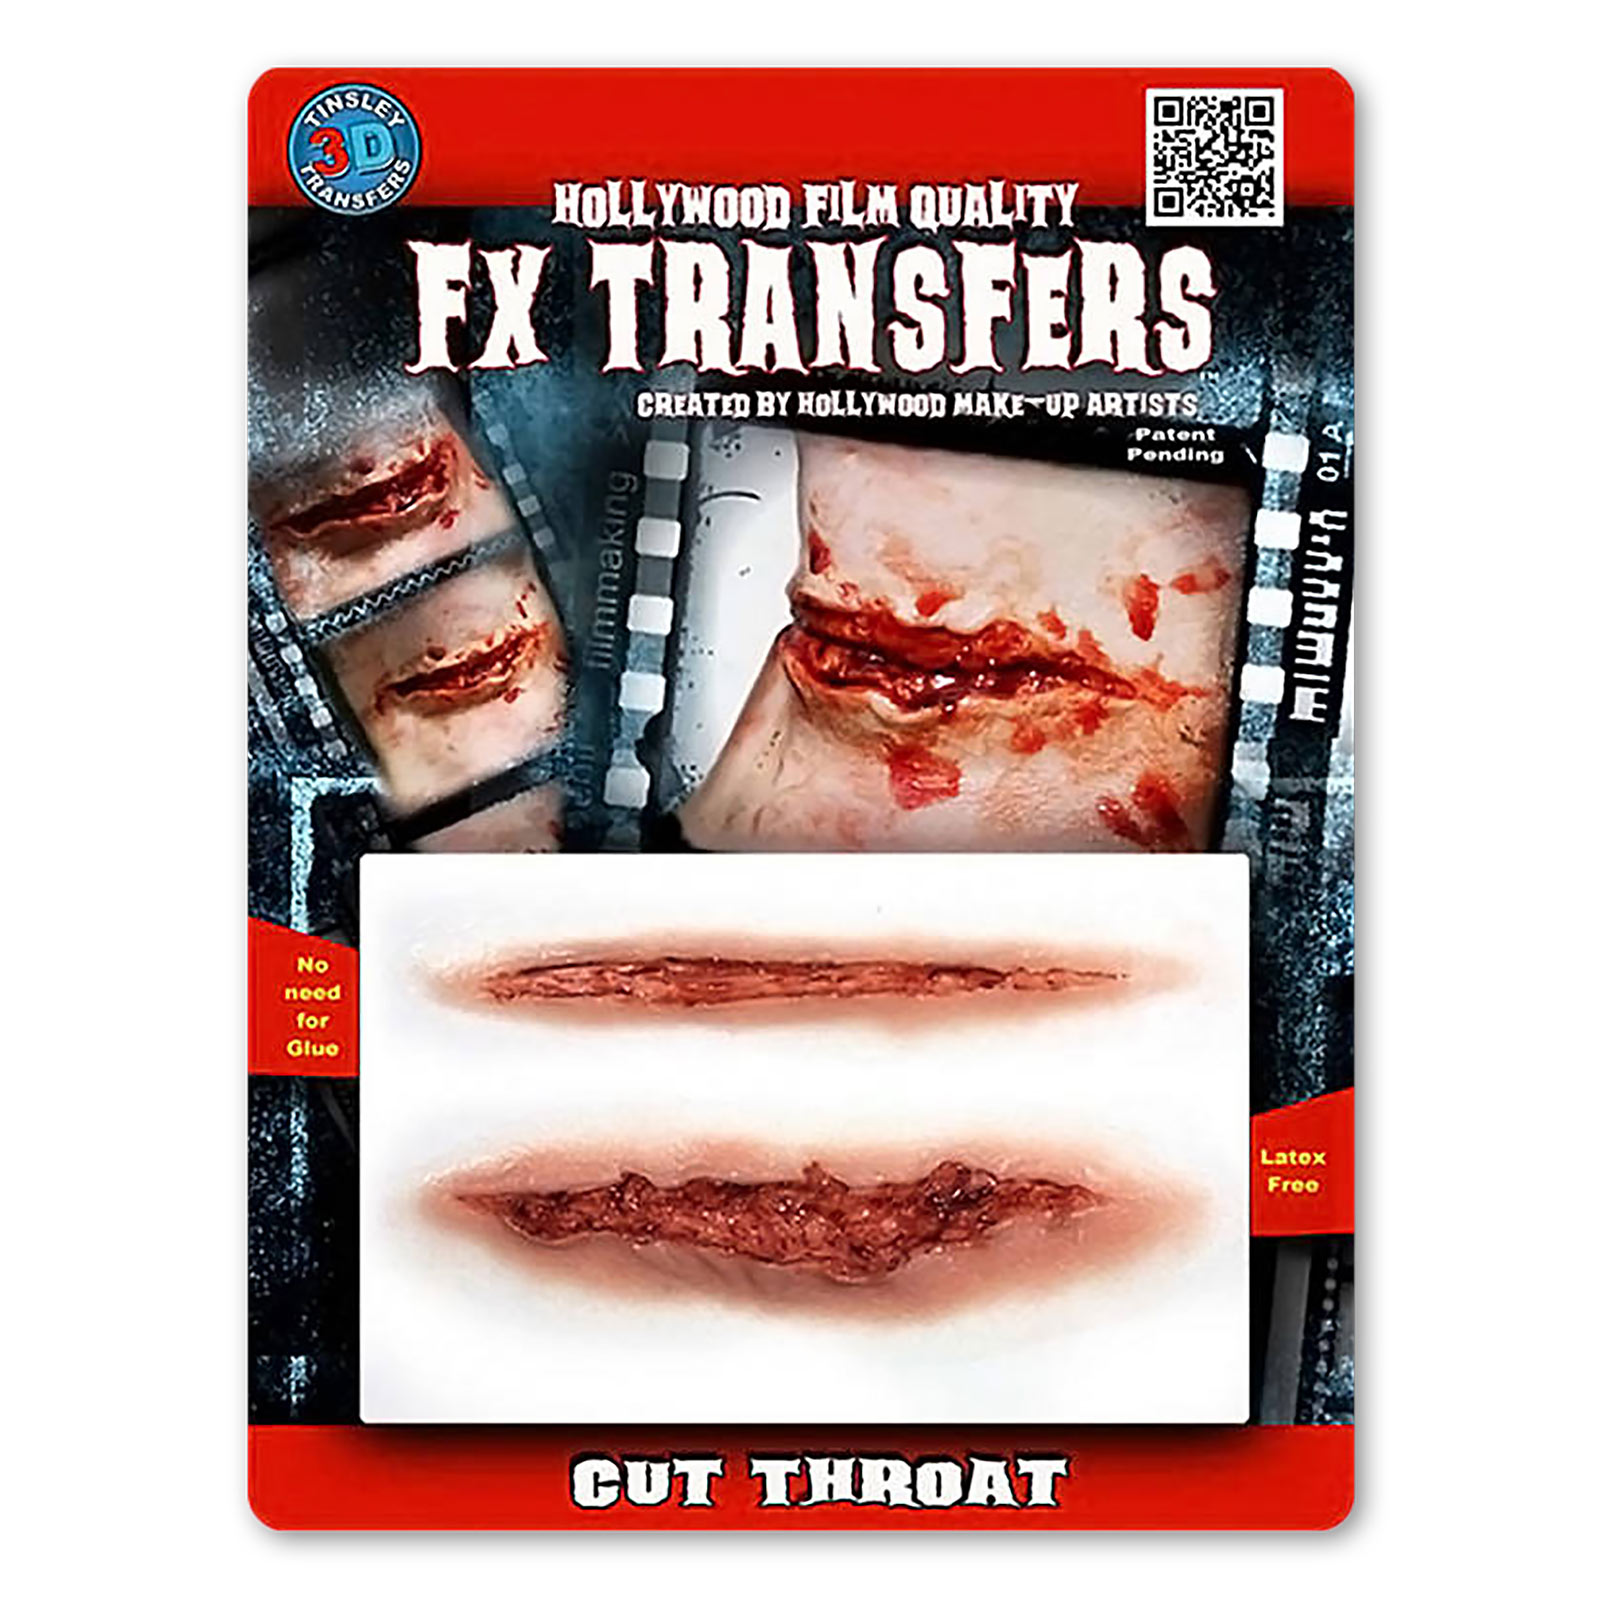 Schnittwunde 3D FX Transfers